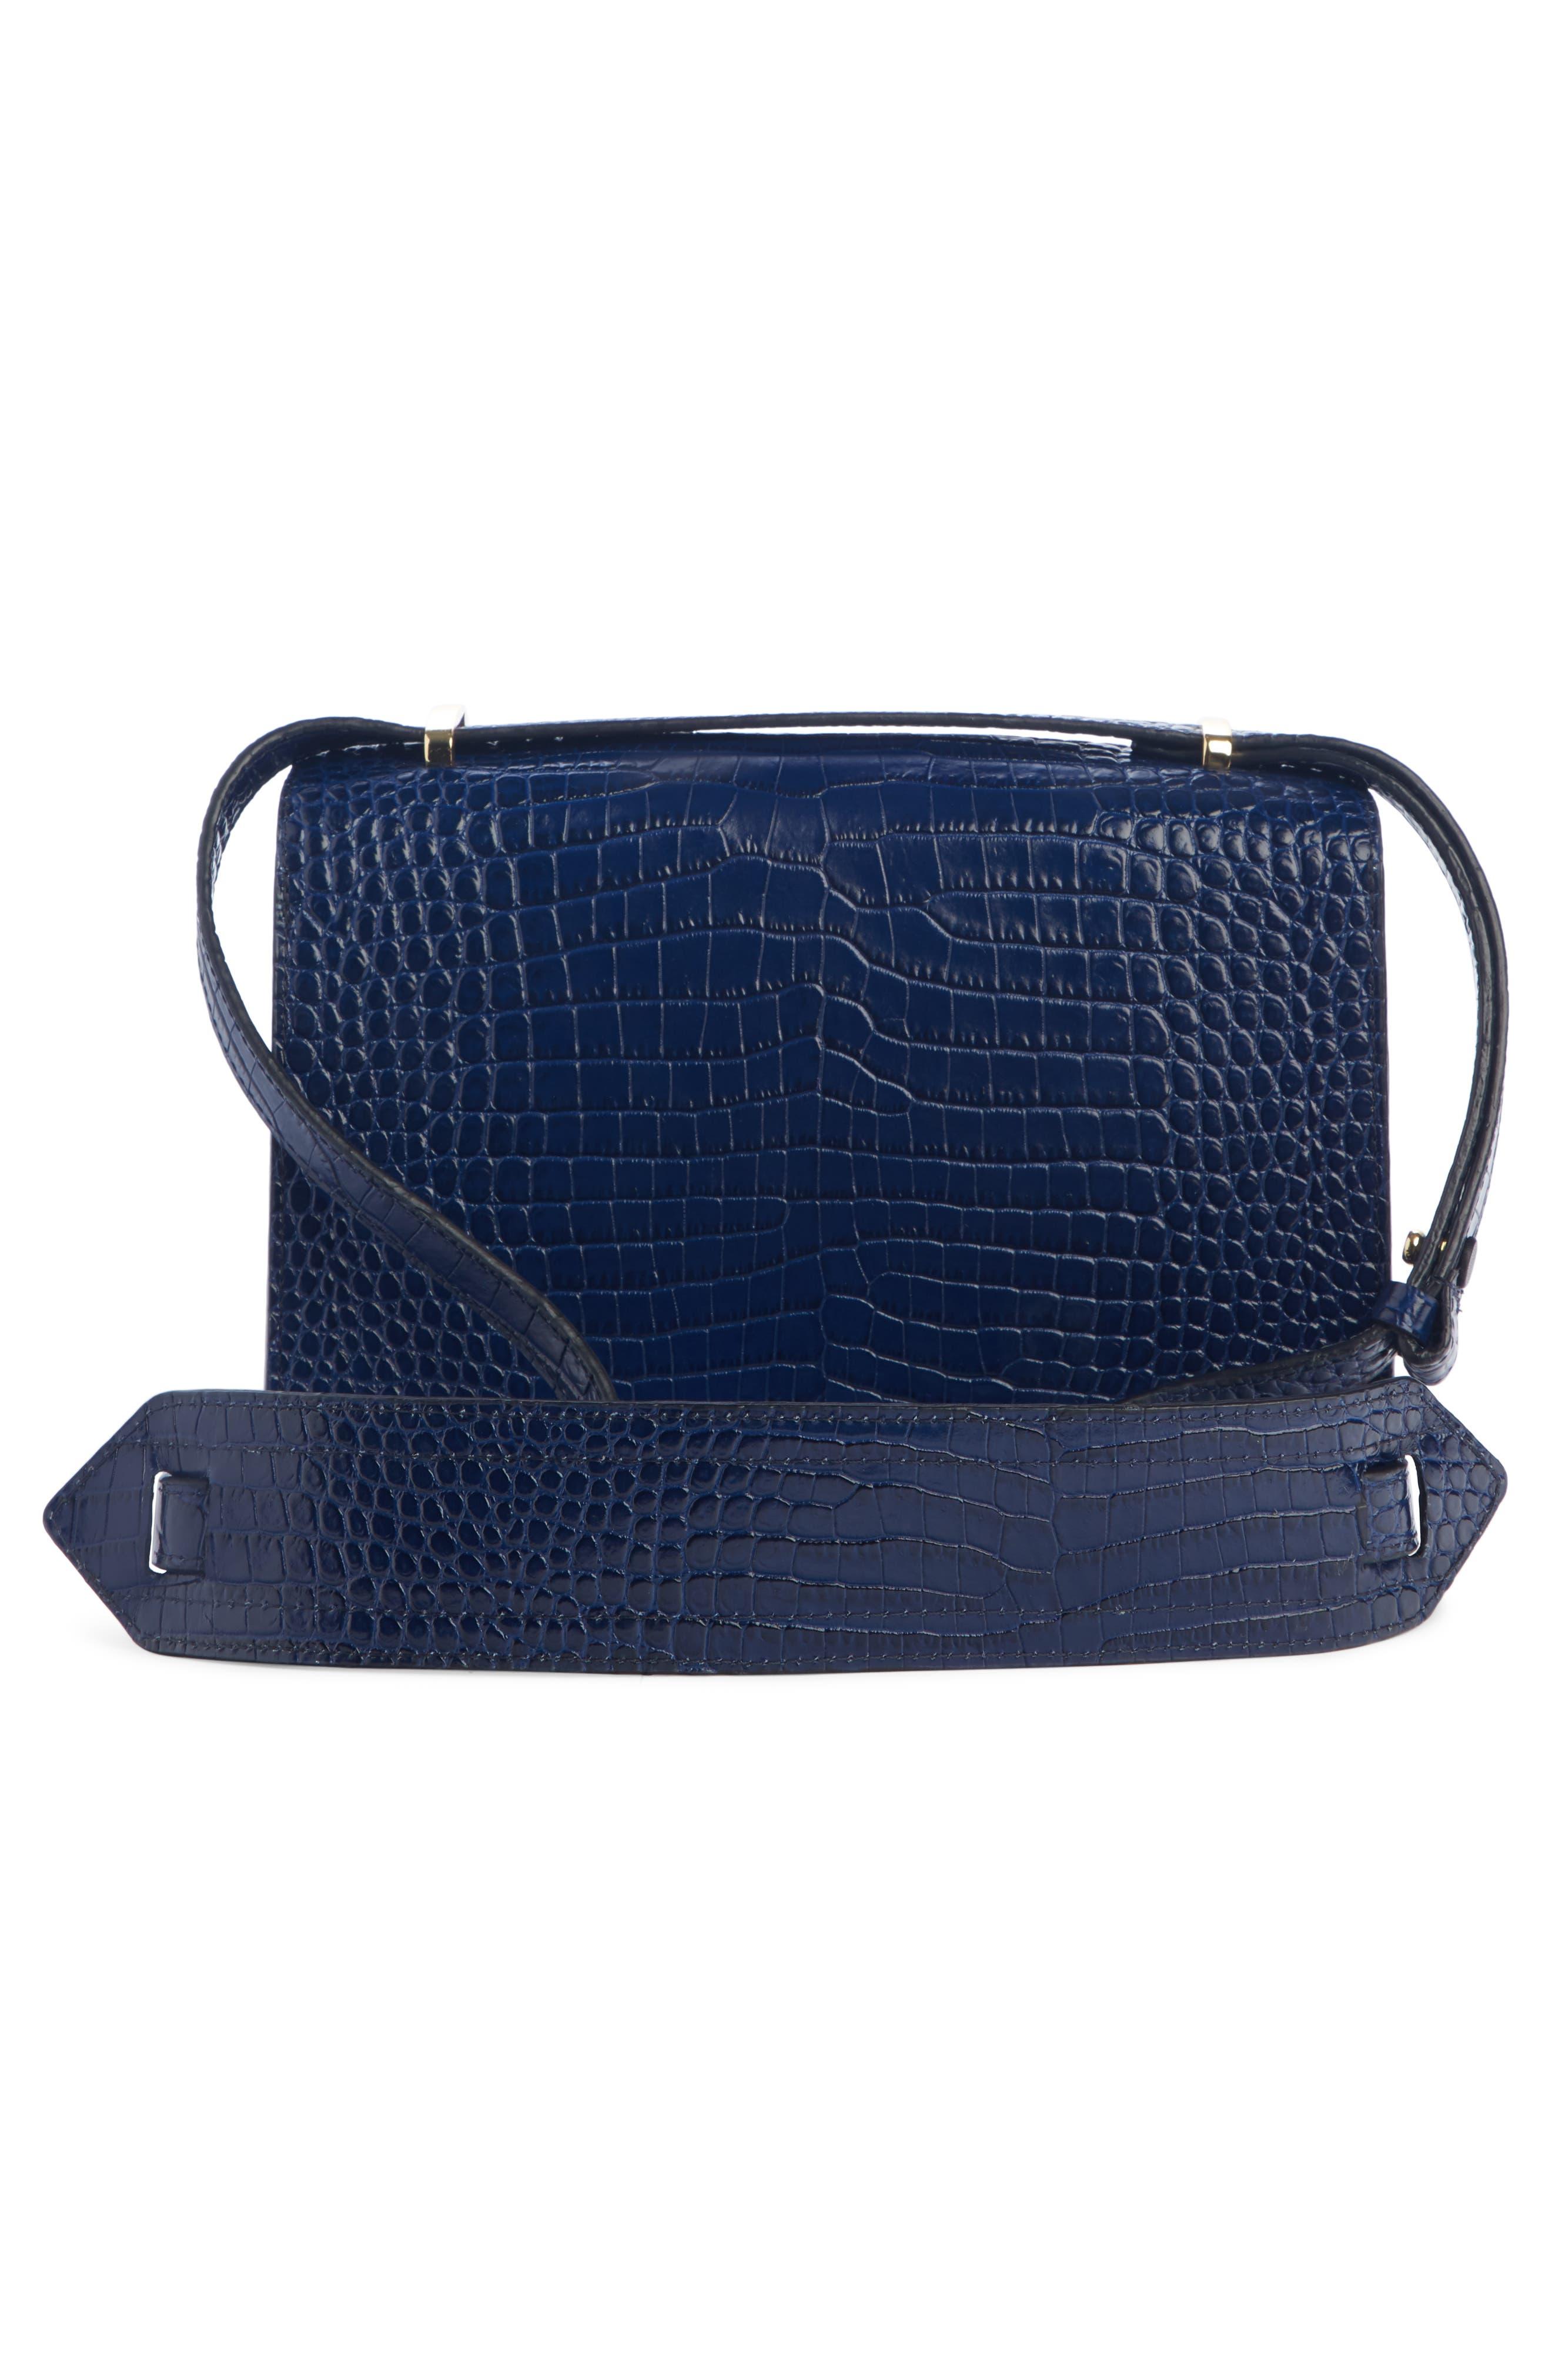 DRIES VAN NOTEN, Croc Embossed Leather Crossbody Bag, Alternate thumbnail 2, color, BLUE